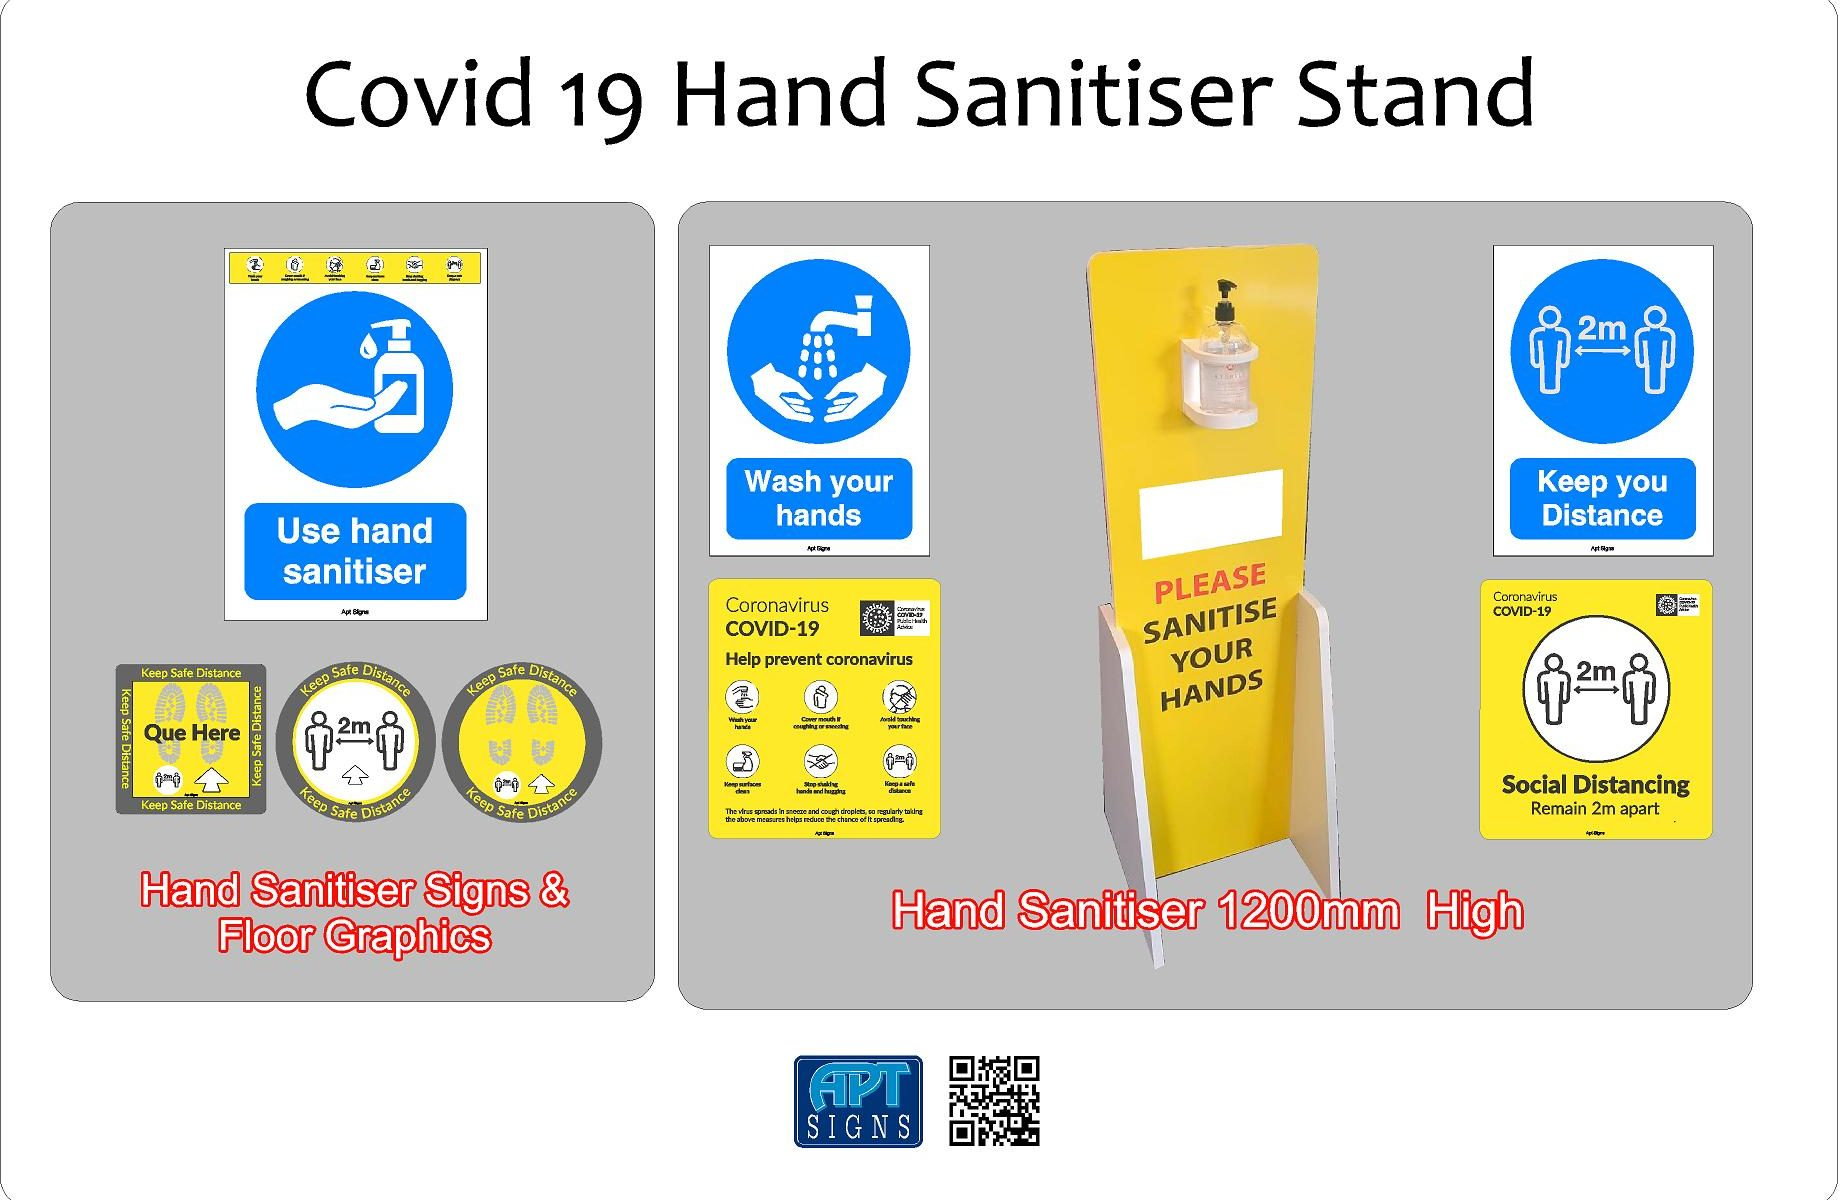 Covid 19 Hand Sanitiser Stand